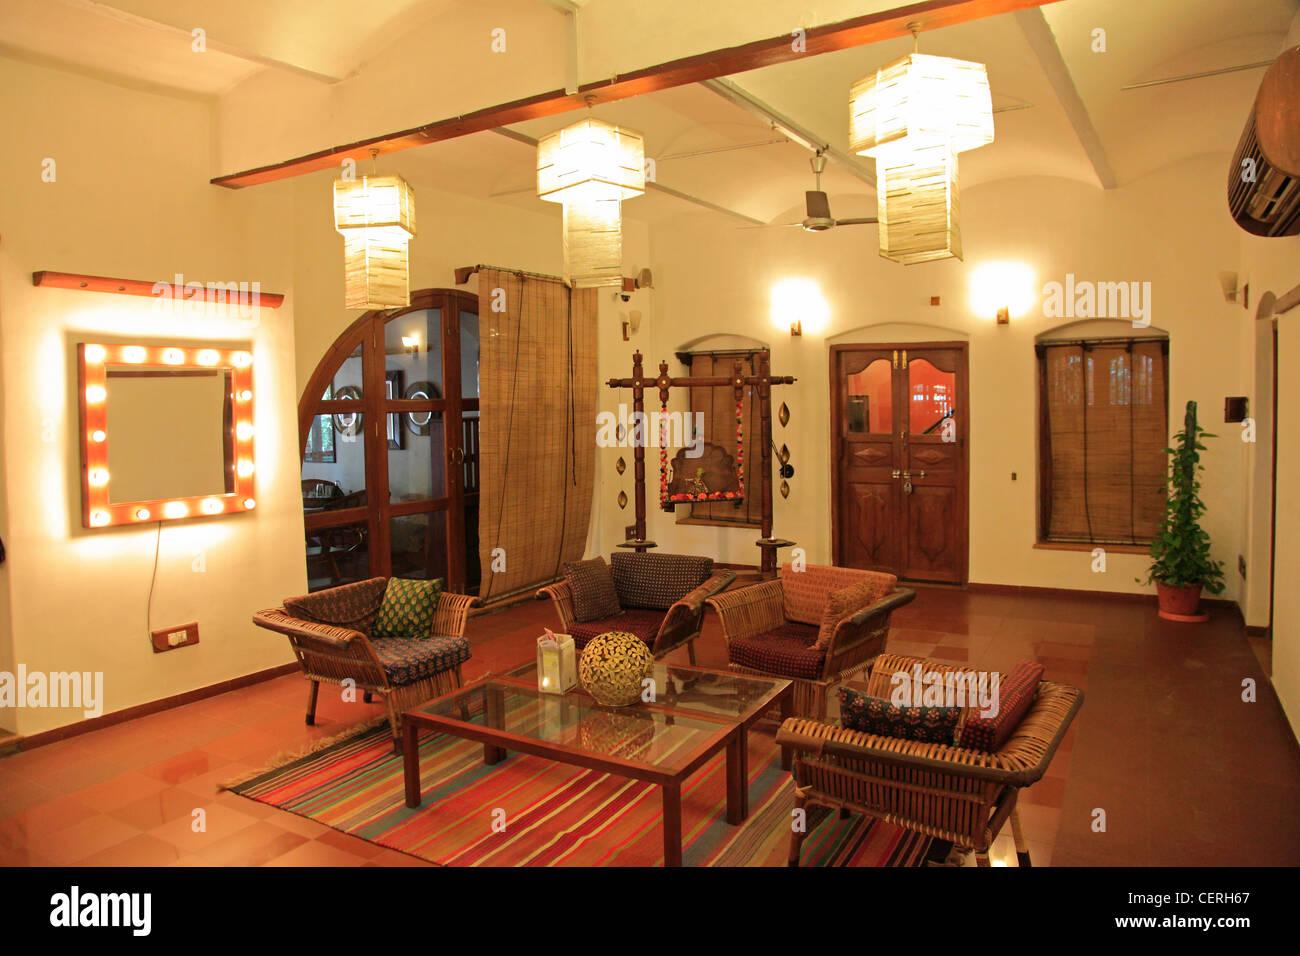 India, Gujarat, Ahmedabad, House of Mangaldas Girdhardas, heritage hotel, - Stock Image